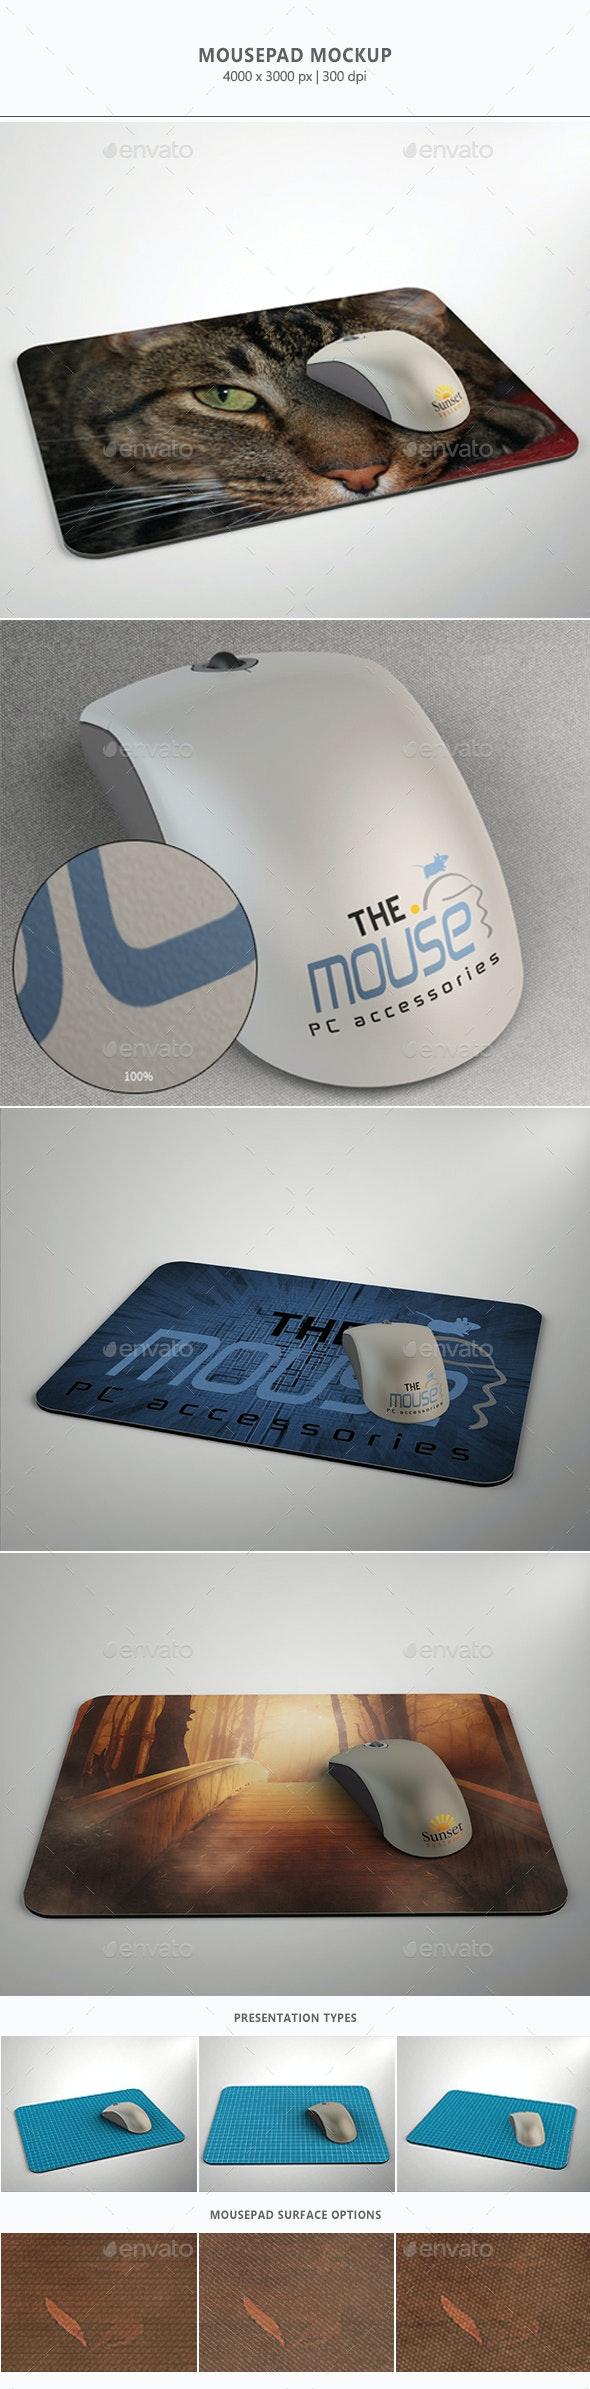 Mousepad/Mouse Mock-up - Miscellaneous Product Mock-Ups